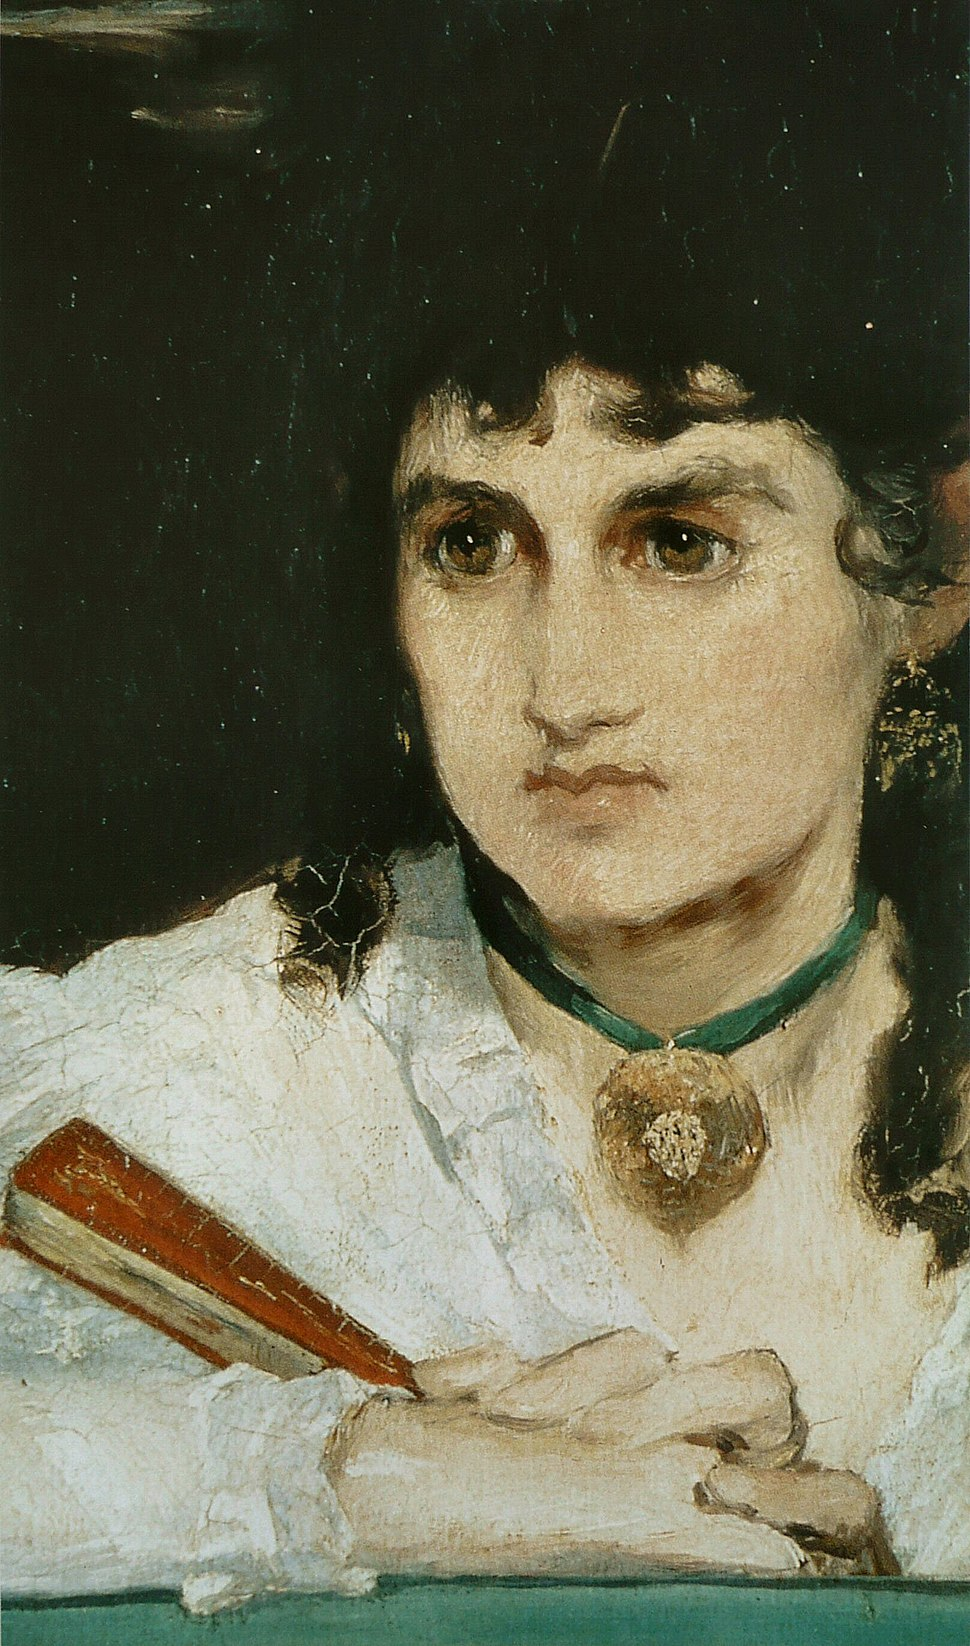 Édouard Manet - Le Balcon